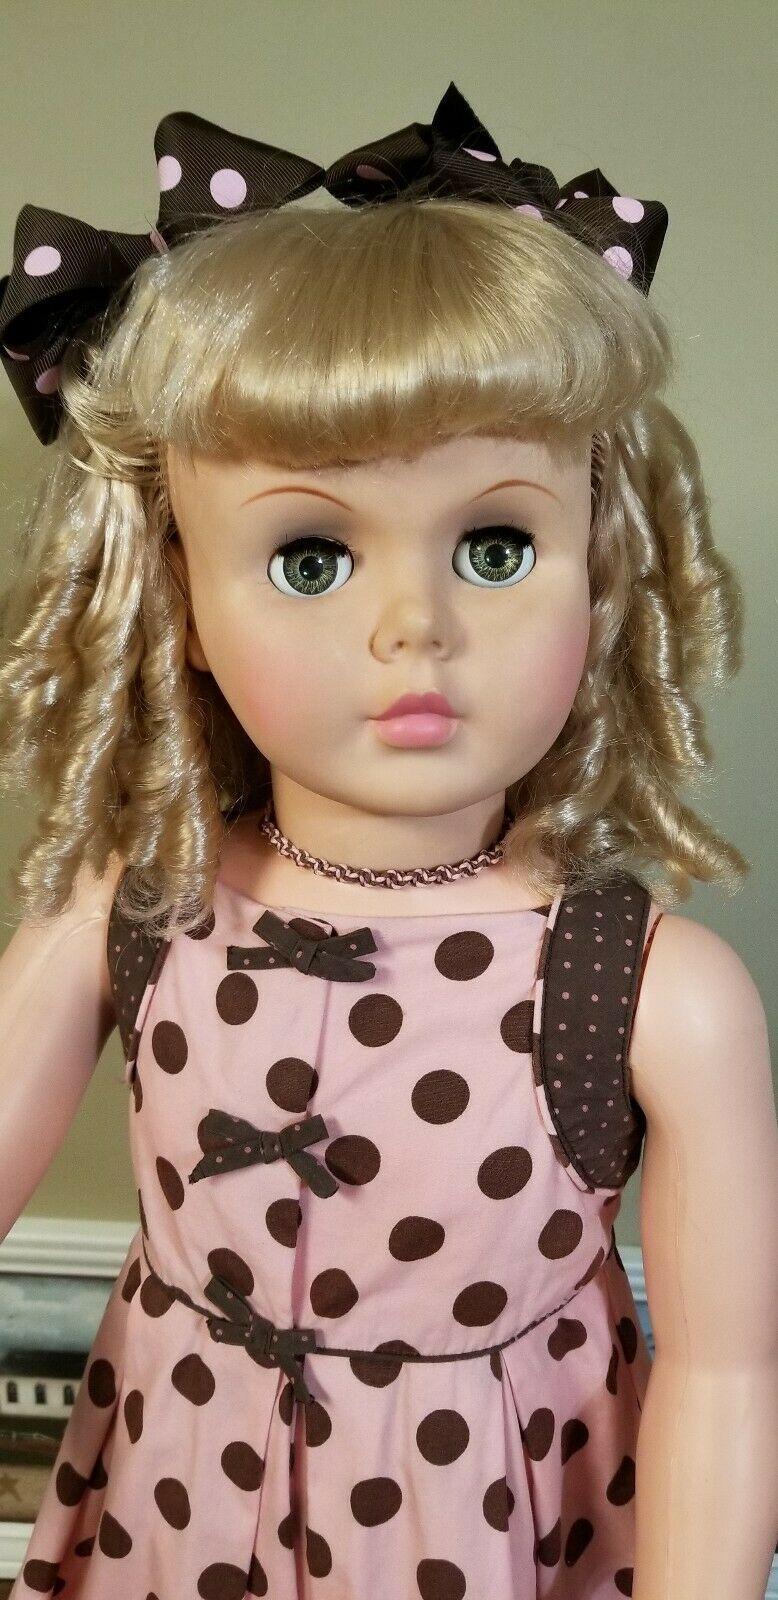 1960 S 36 A E Patti Playpal Companion Blonde Curly Hair Ebay